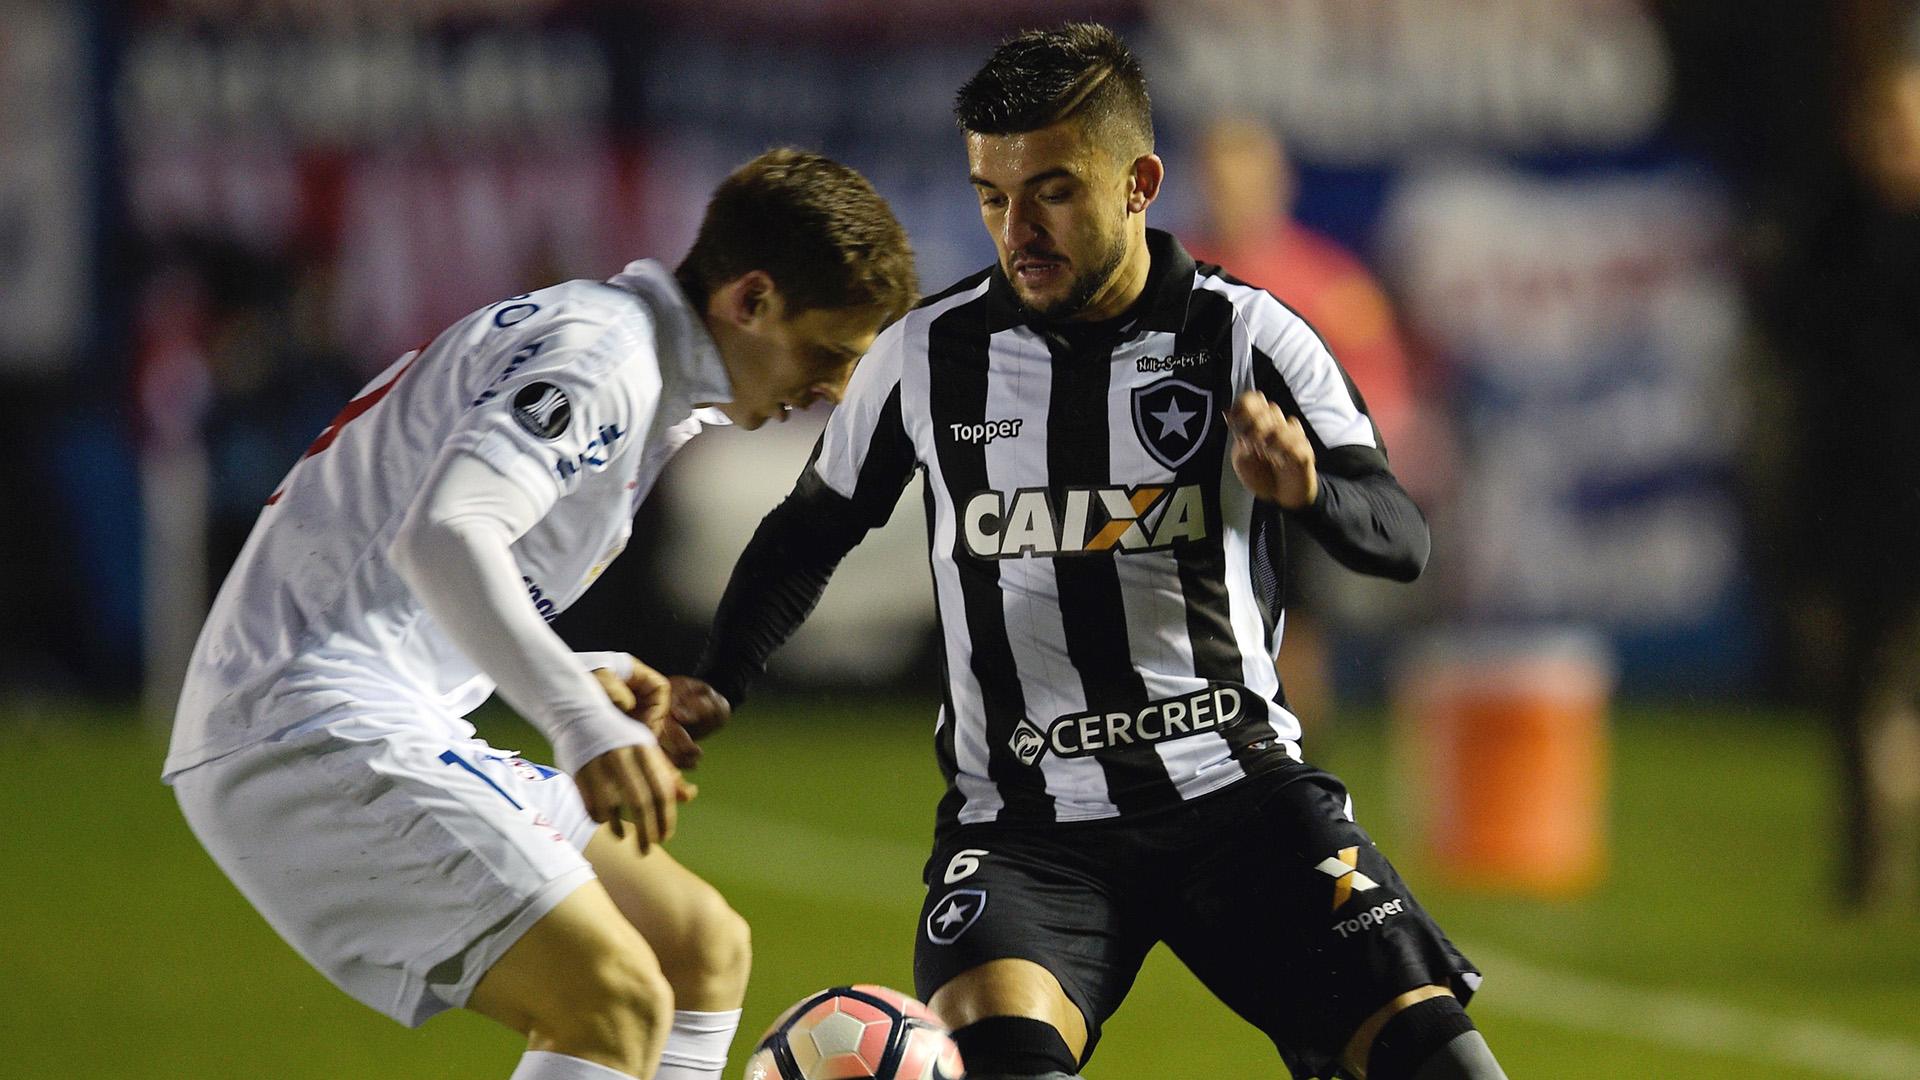 Santiago Romero Victor Luis Nacional-URU Botafogo Libertadores 06072017